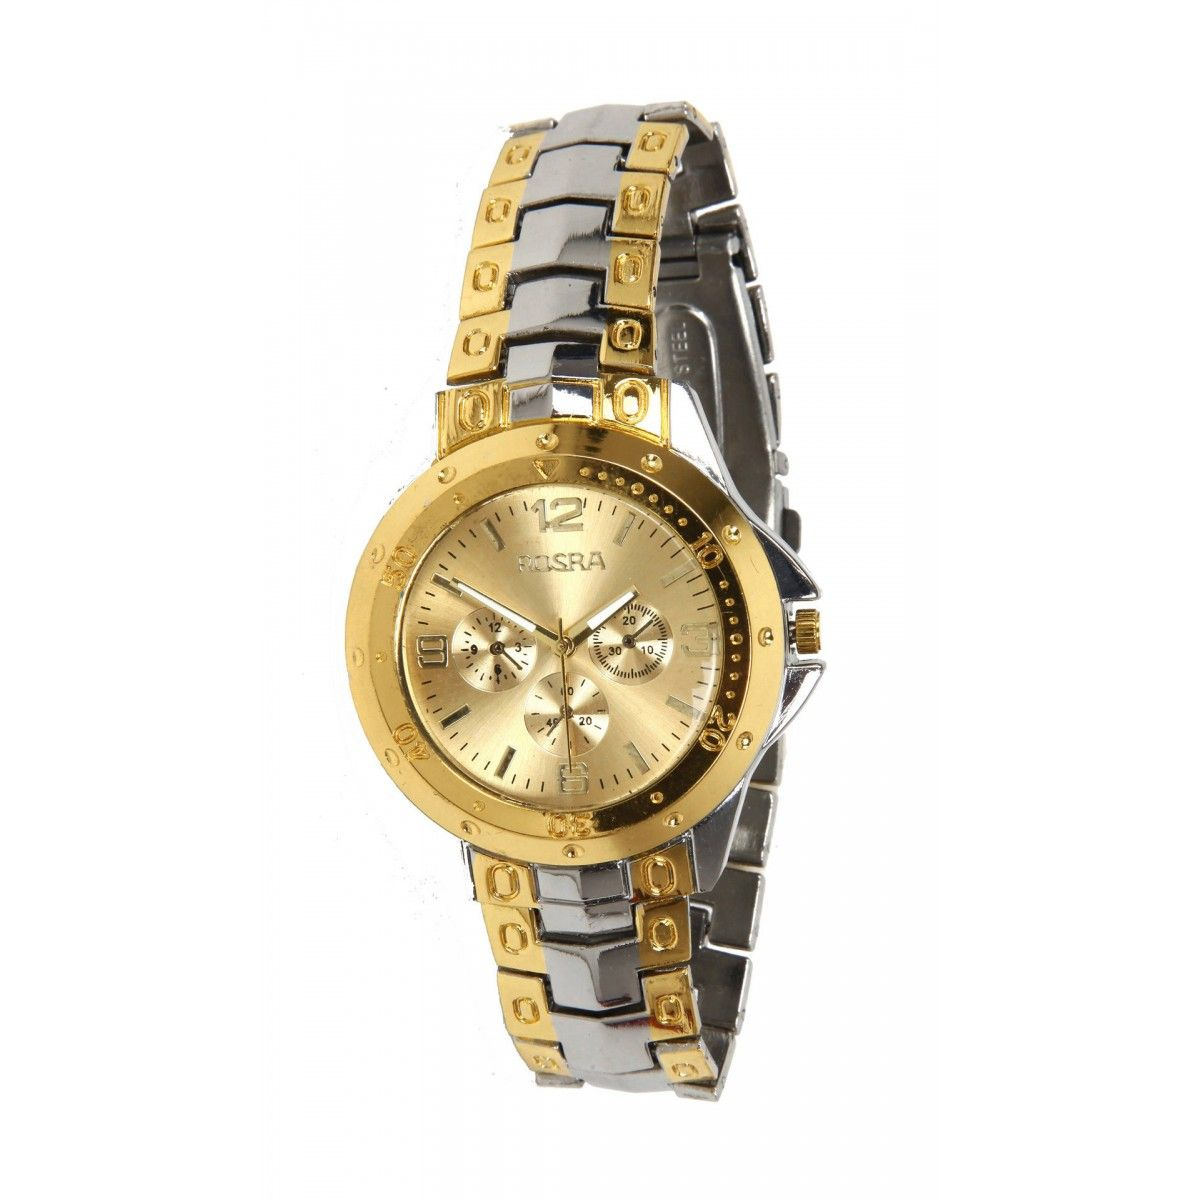 Stylish rosra analog silver metal wrist watch